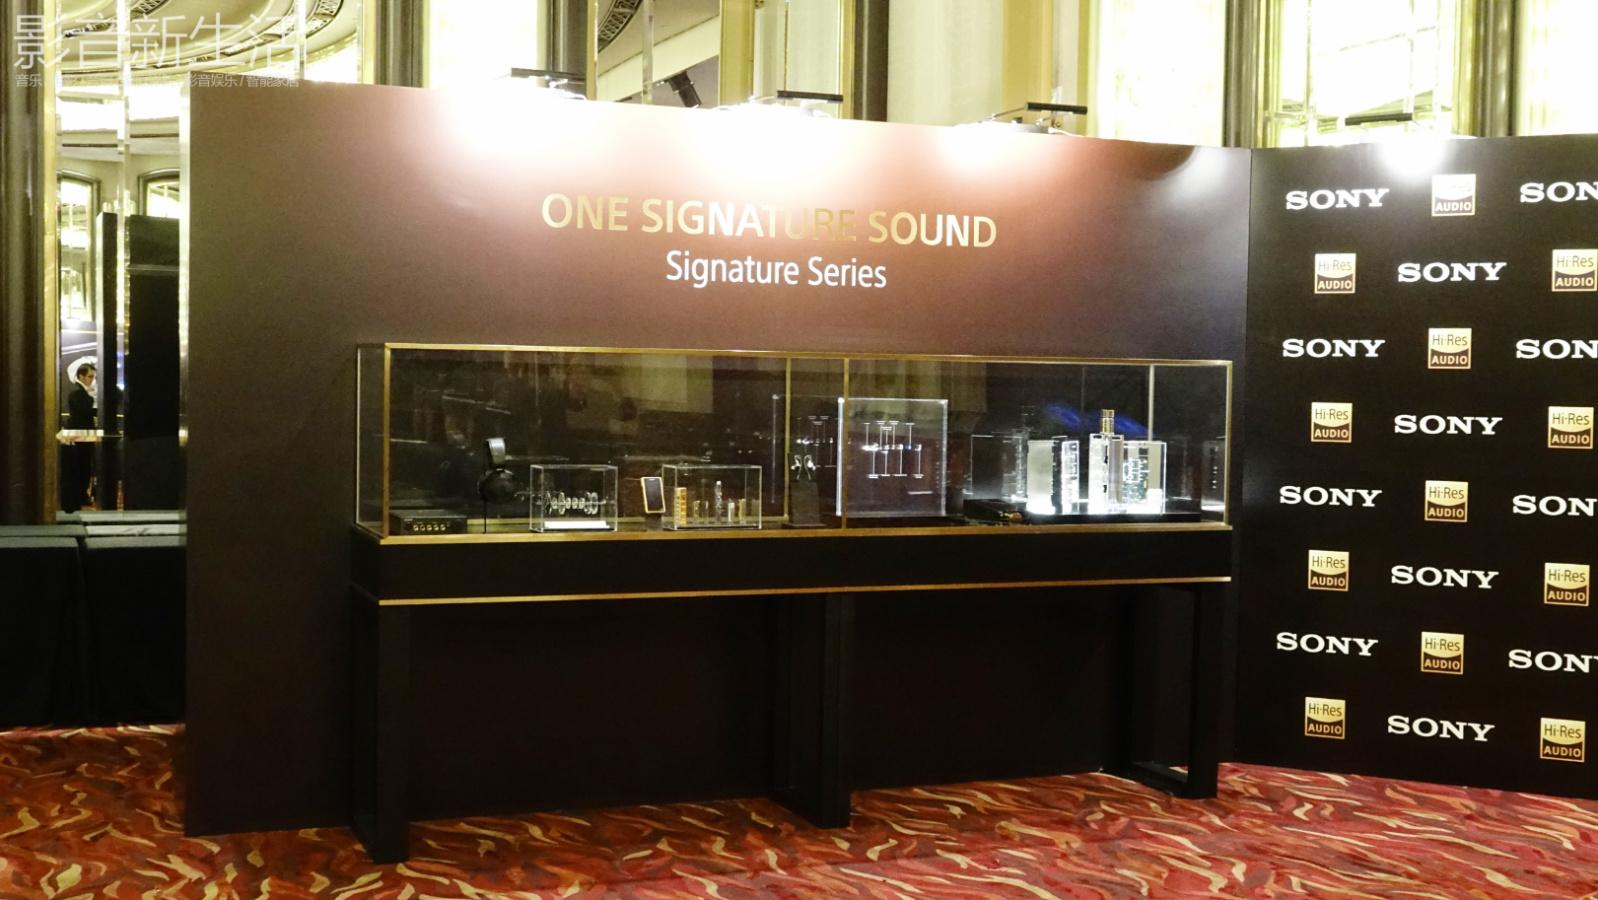 "Sony Hi Res 2018 34 - 新品 | ""重塑随身音乐娱乐王朝!"":Sony索尼发布Signature醇音系列新兄弟IER-Z1R和DMP-Z1,以及舞台监听耳机系列:IER-M7和IER-M9,还有升级款MDR-Z7M2!"